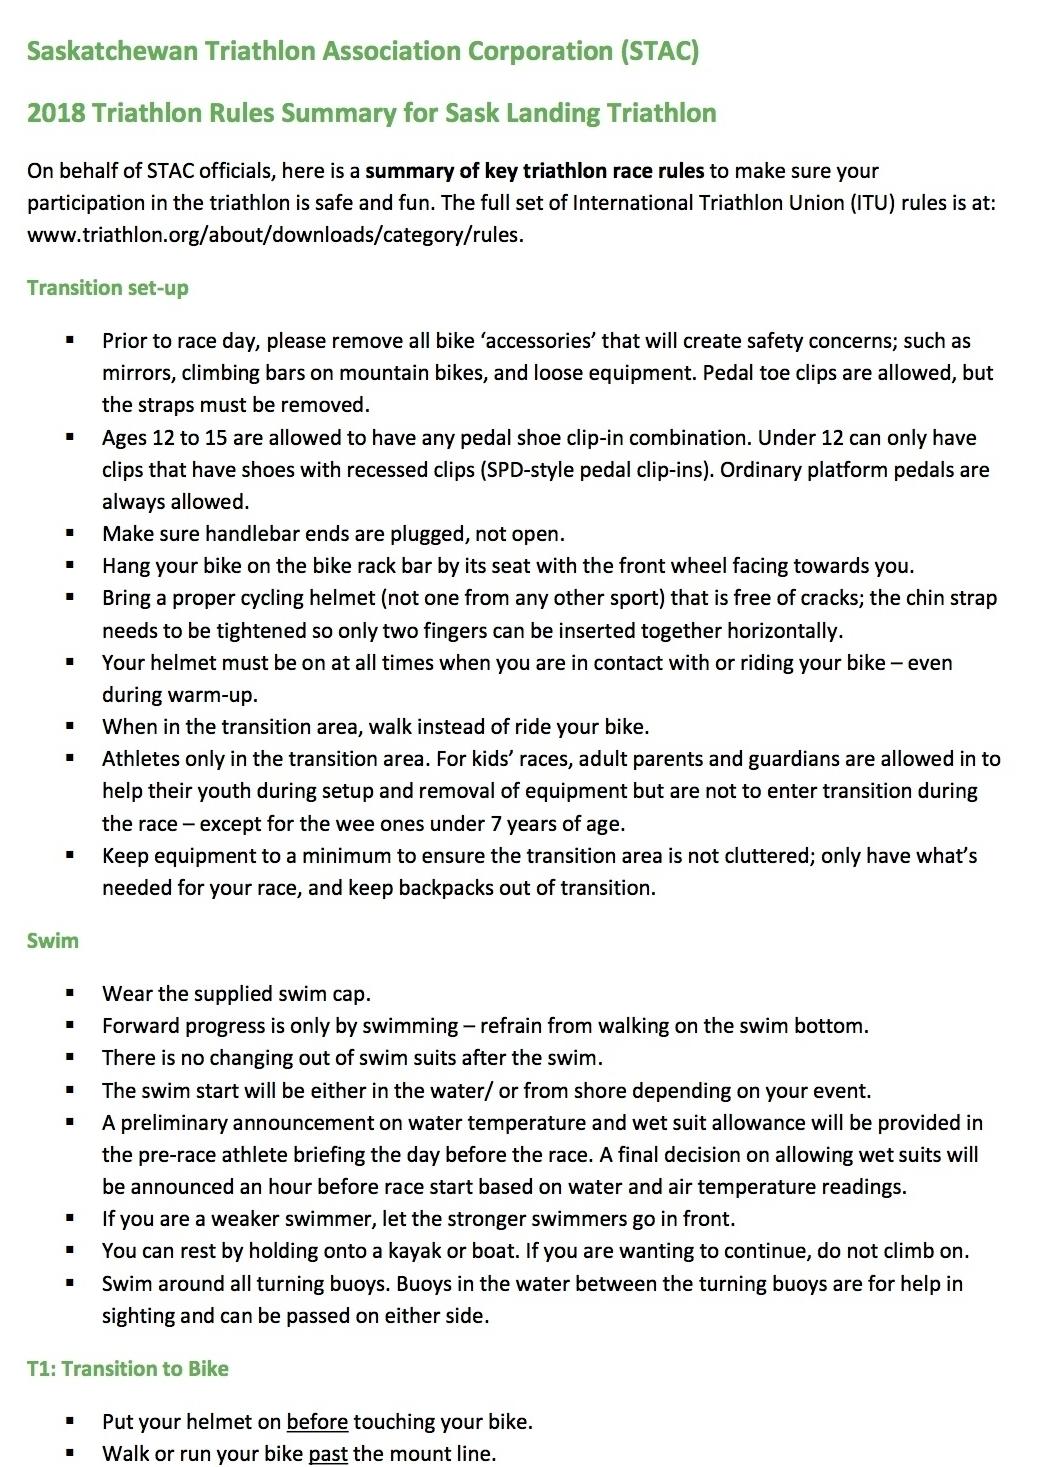 STAC Summary of Race Rules 2018 Sask Landing Triathlon.jpg